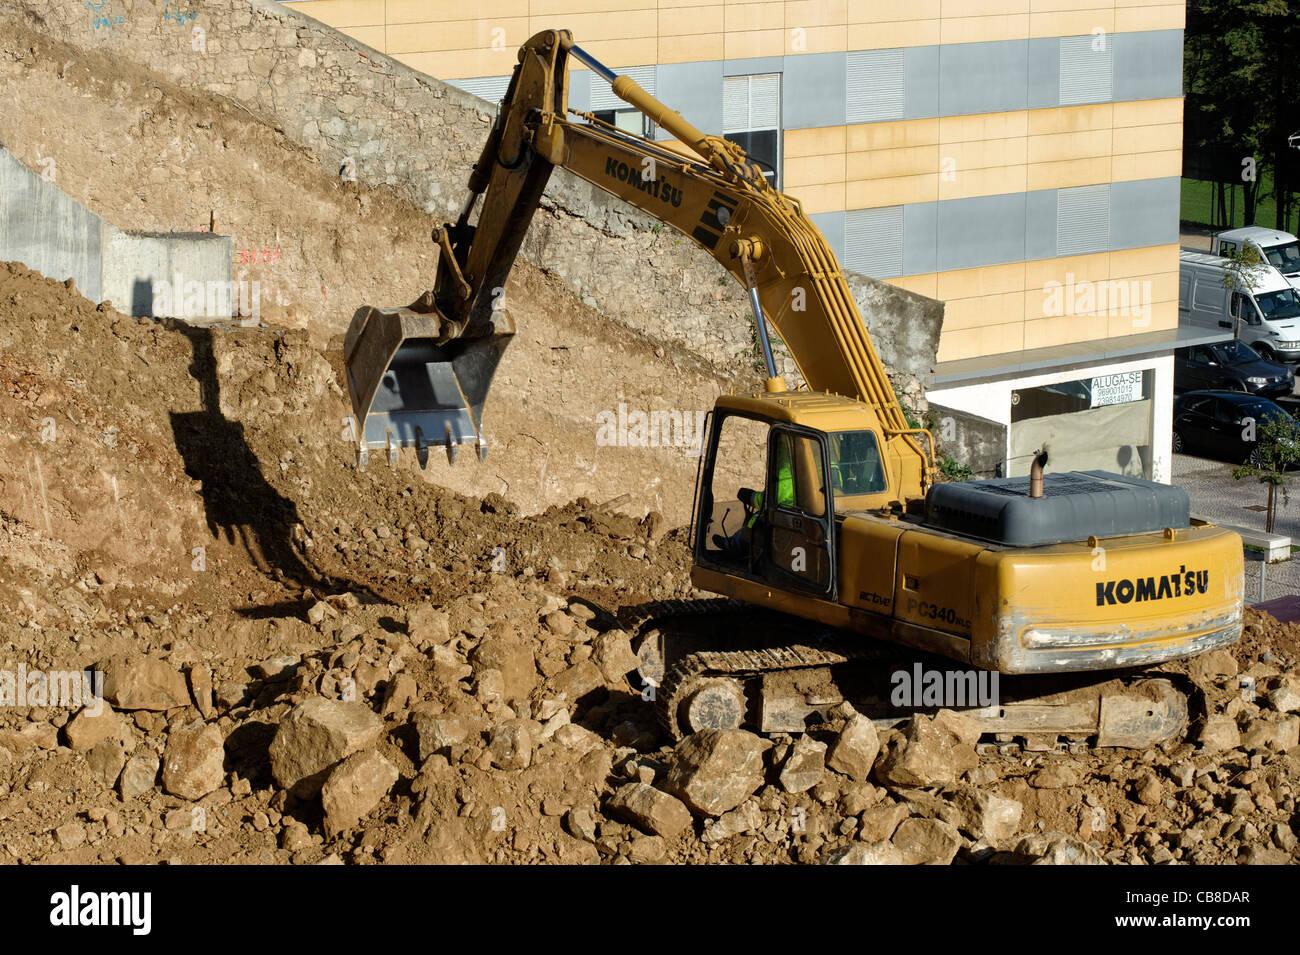 Digger - Stock Image